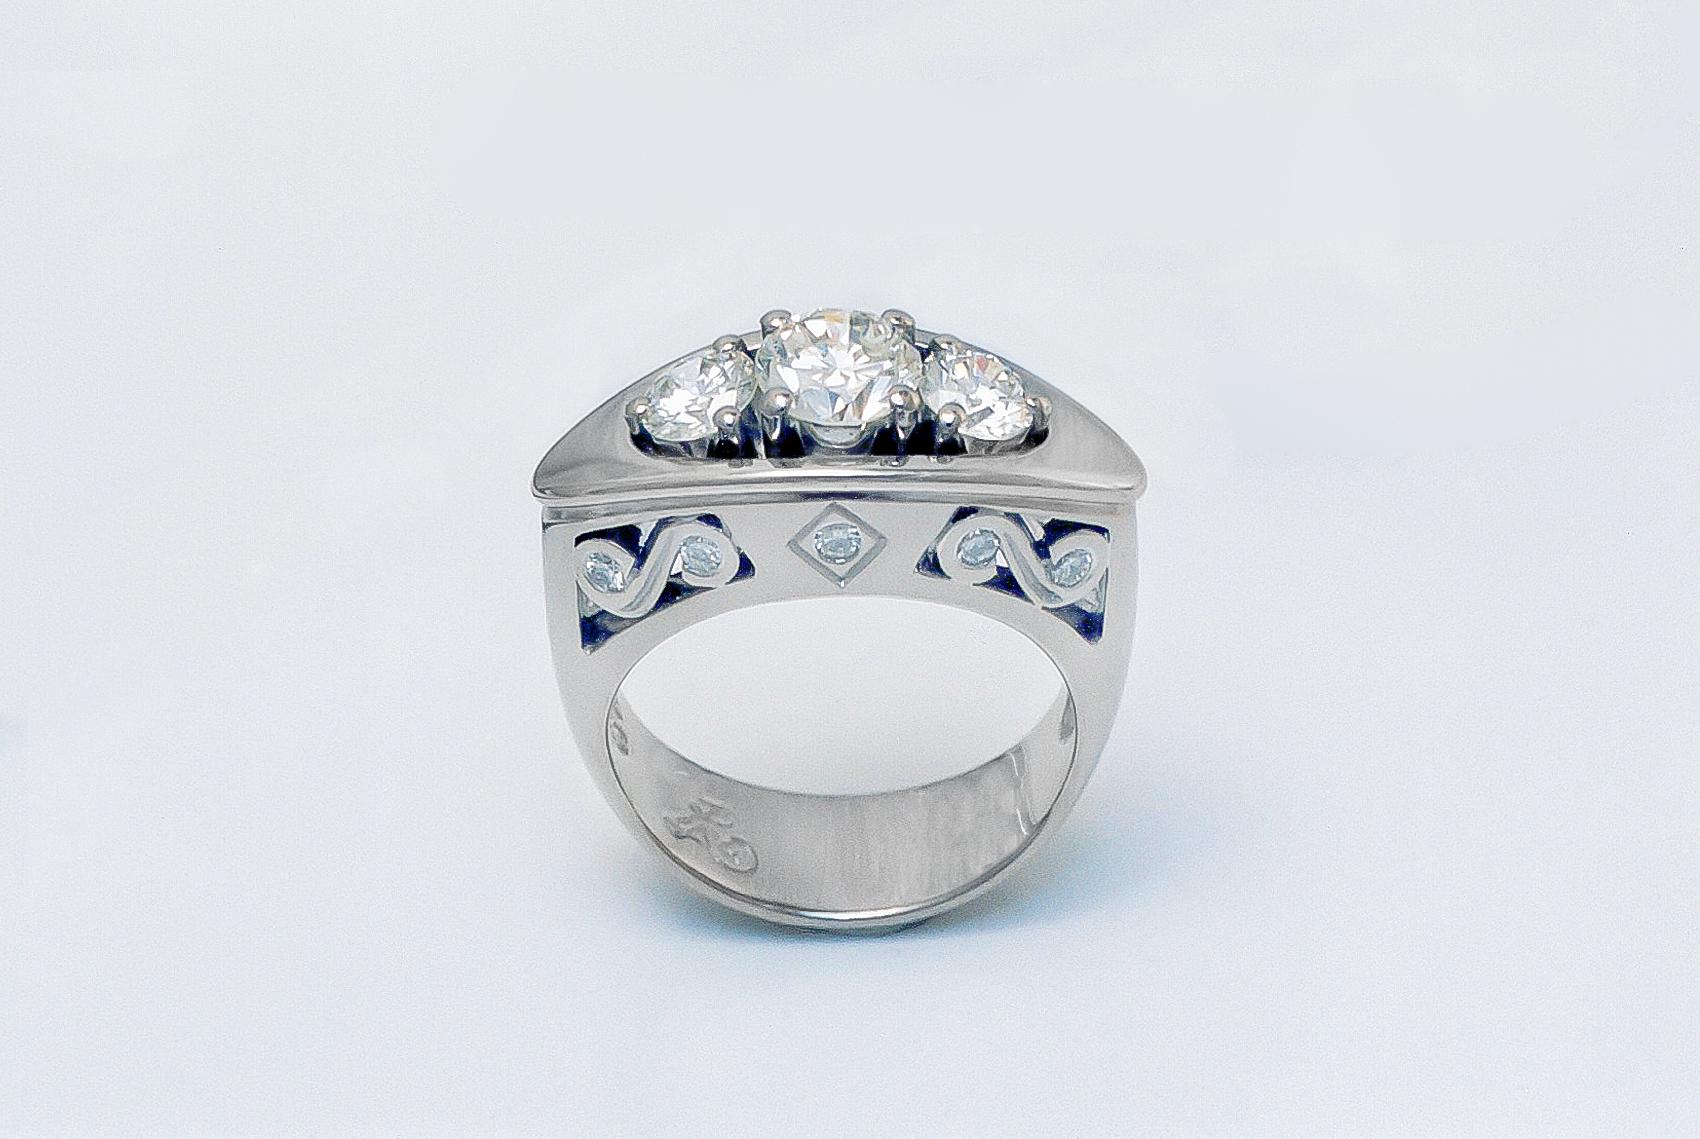 Decorative 3 Stone Diamond Ring